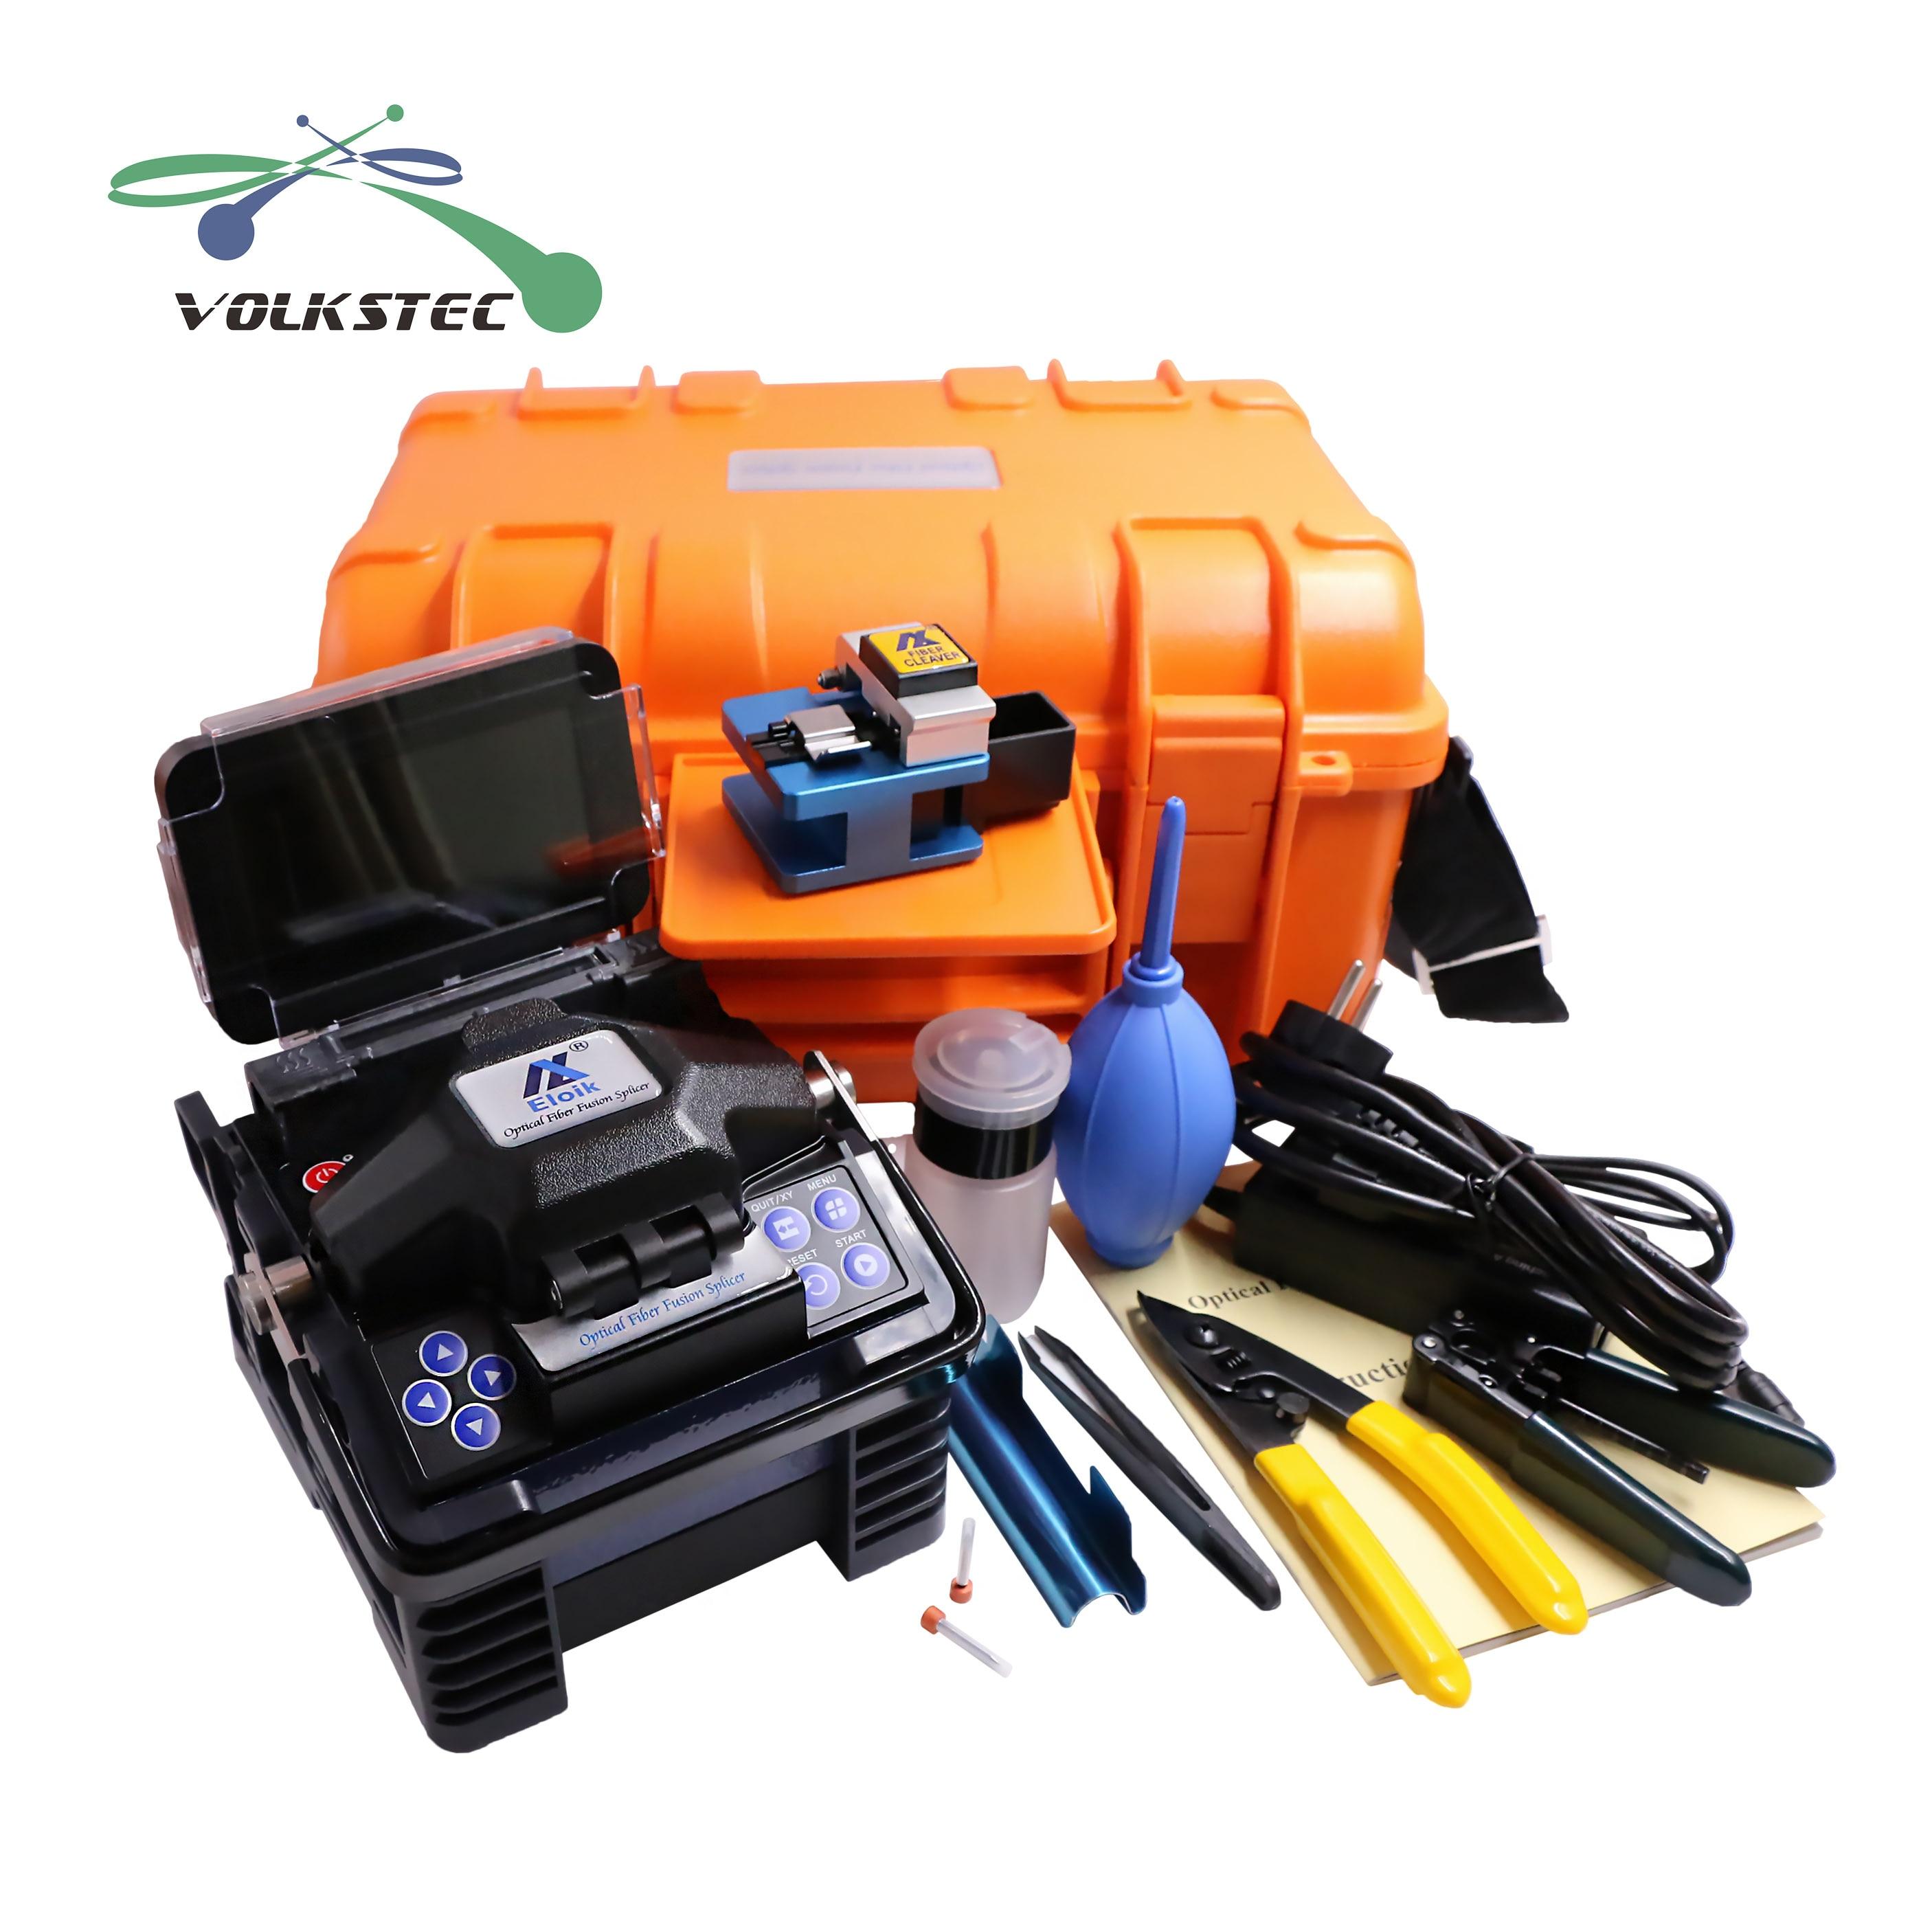 Eloik ALK-88 Fiber Optic Splicing Machine Fusion Splicer device tool kits free shipping фото